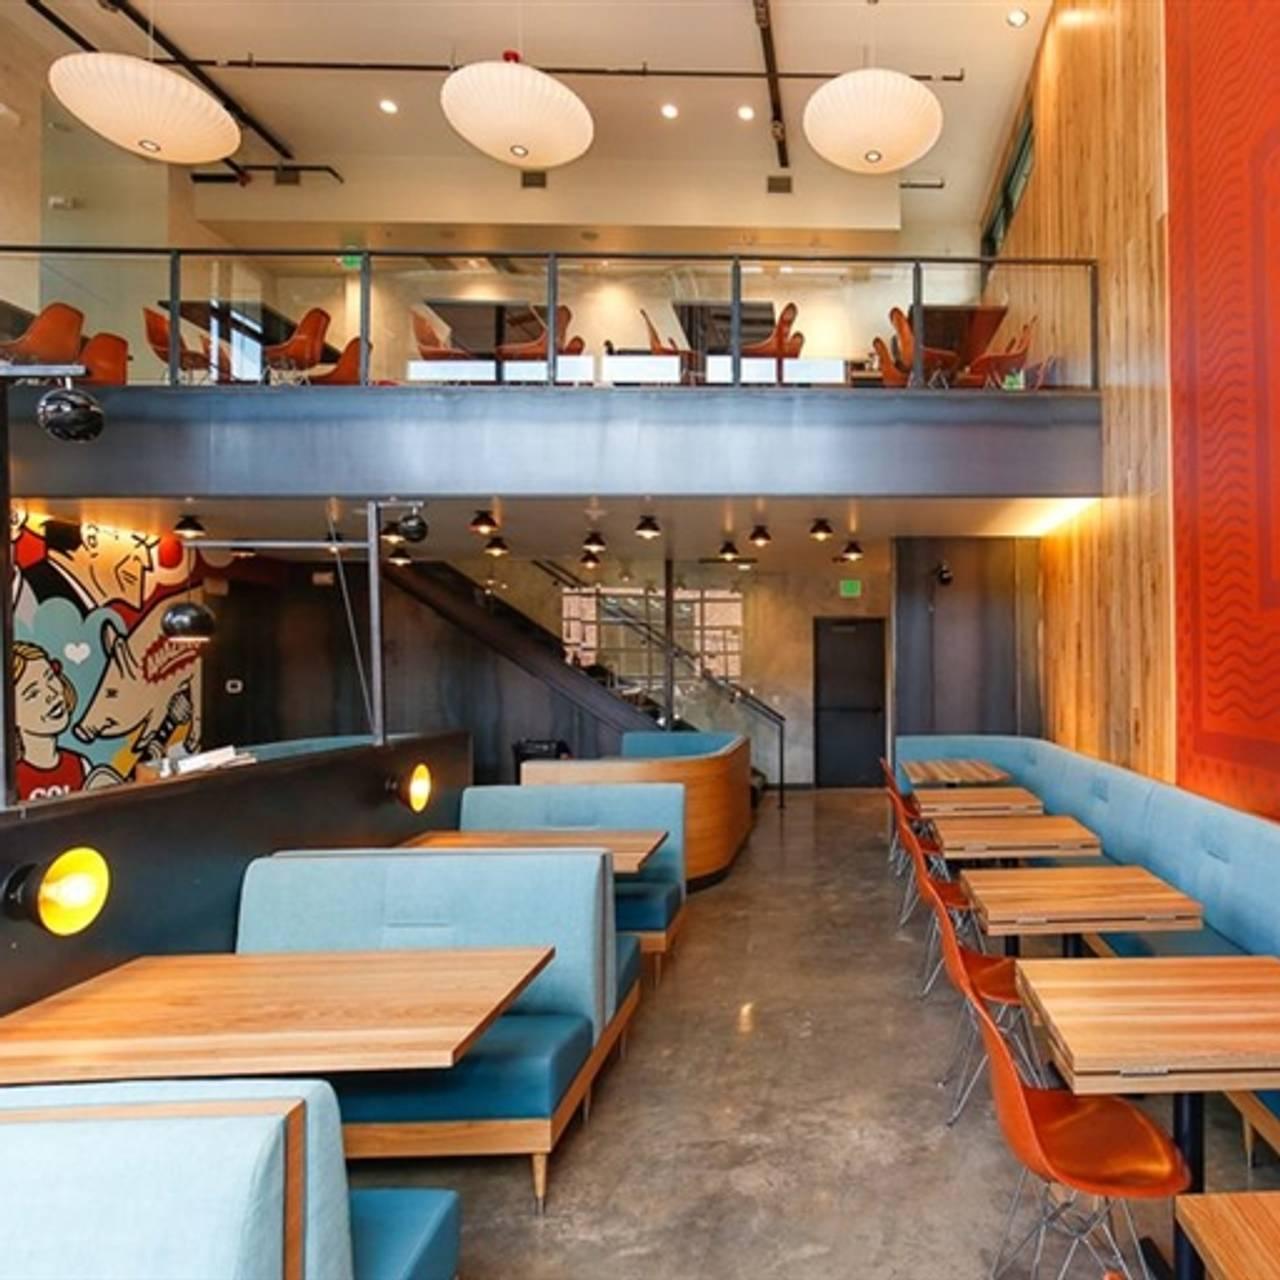 Bacon Social House Restaurant Denver CO OpenTable